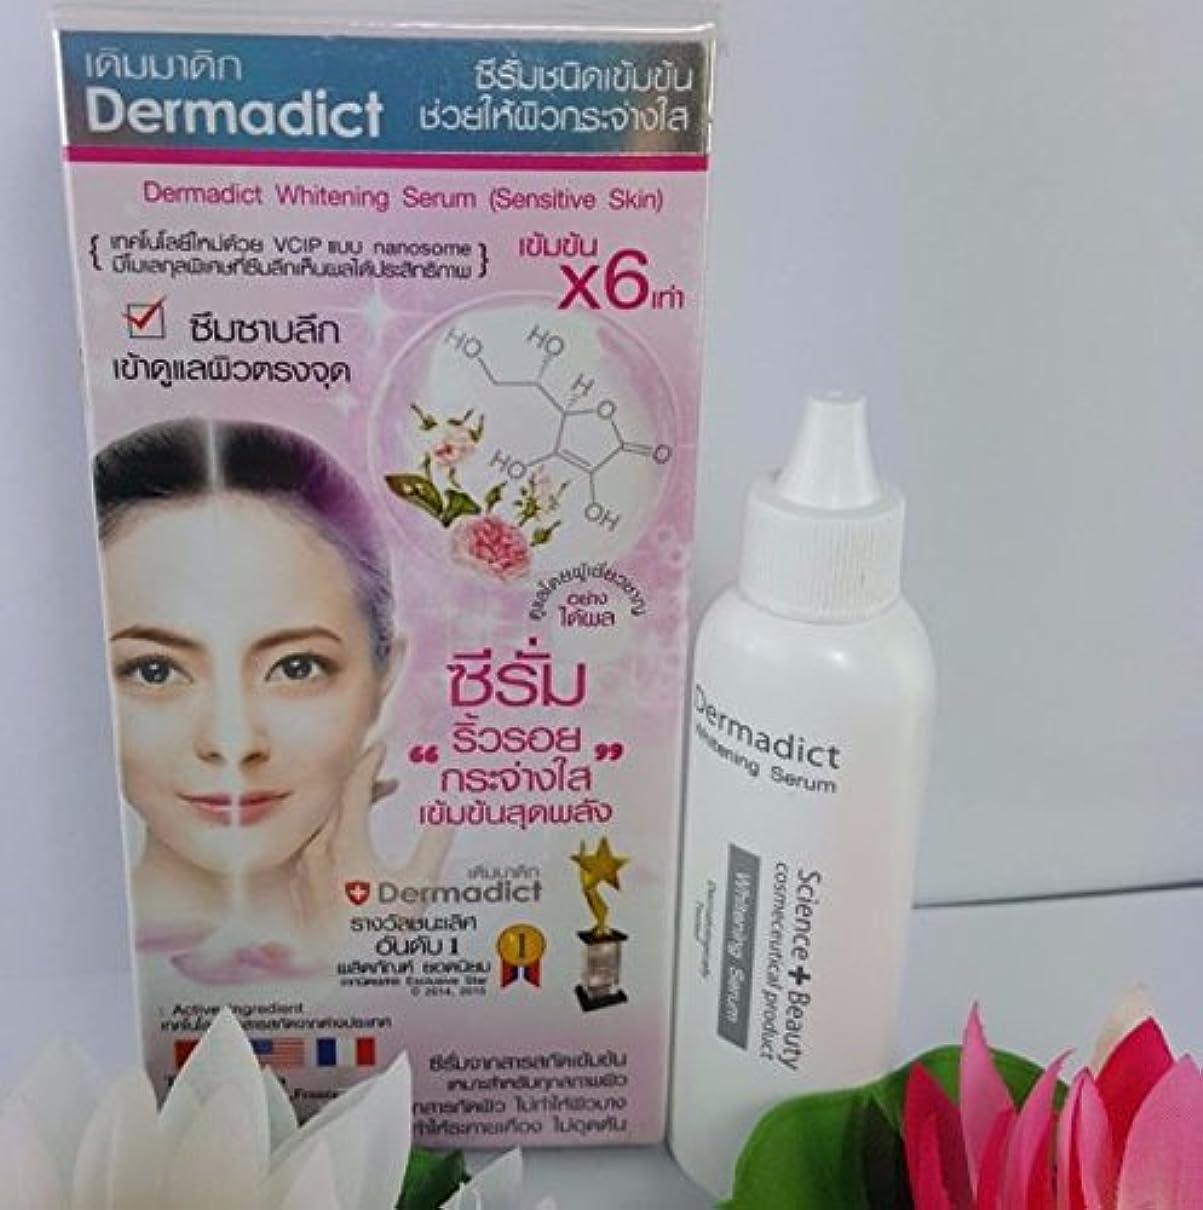 スーパー文房具抽選DERMADICT Whitening Serum Skin Cream Repair Sensitive Skin 15ml